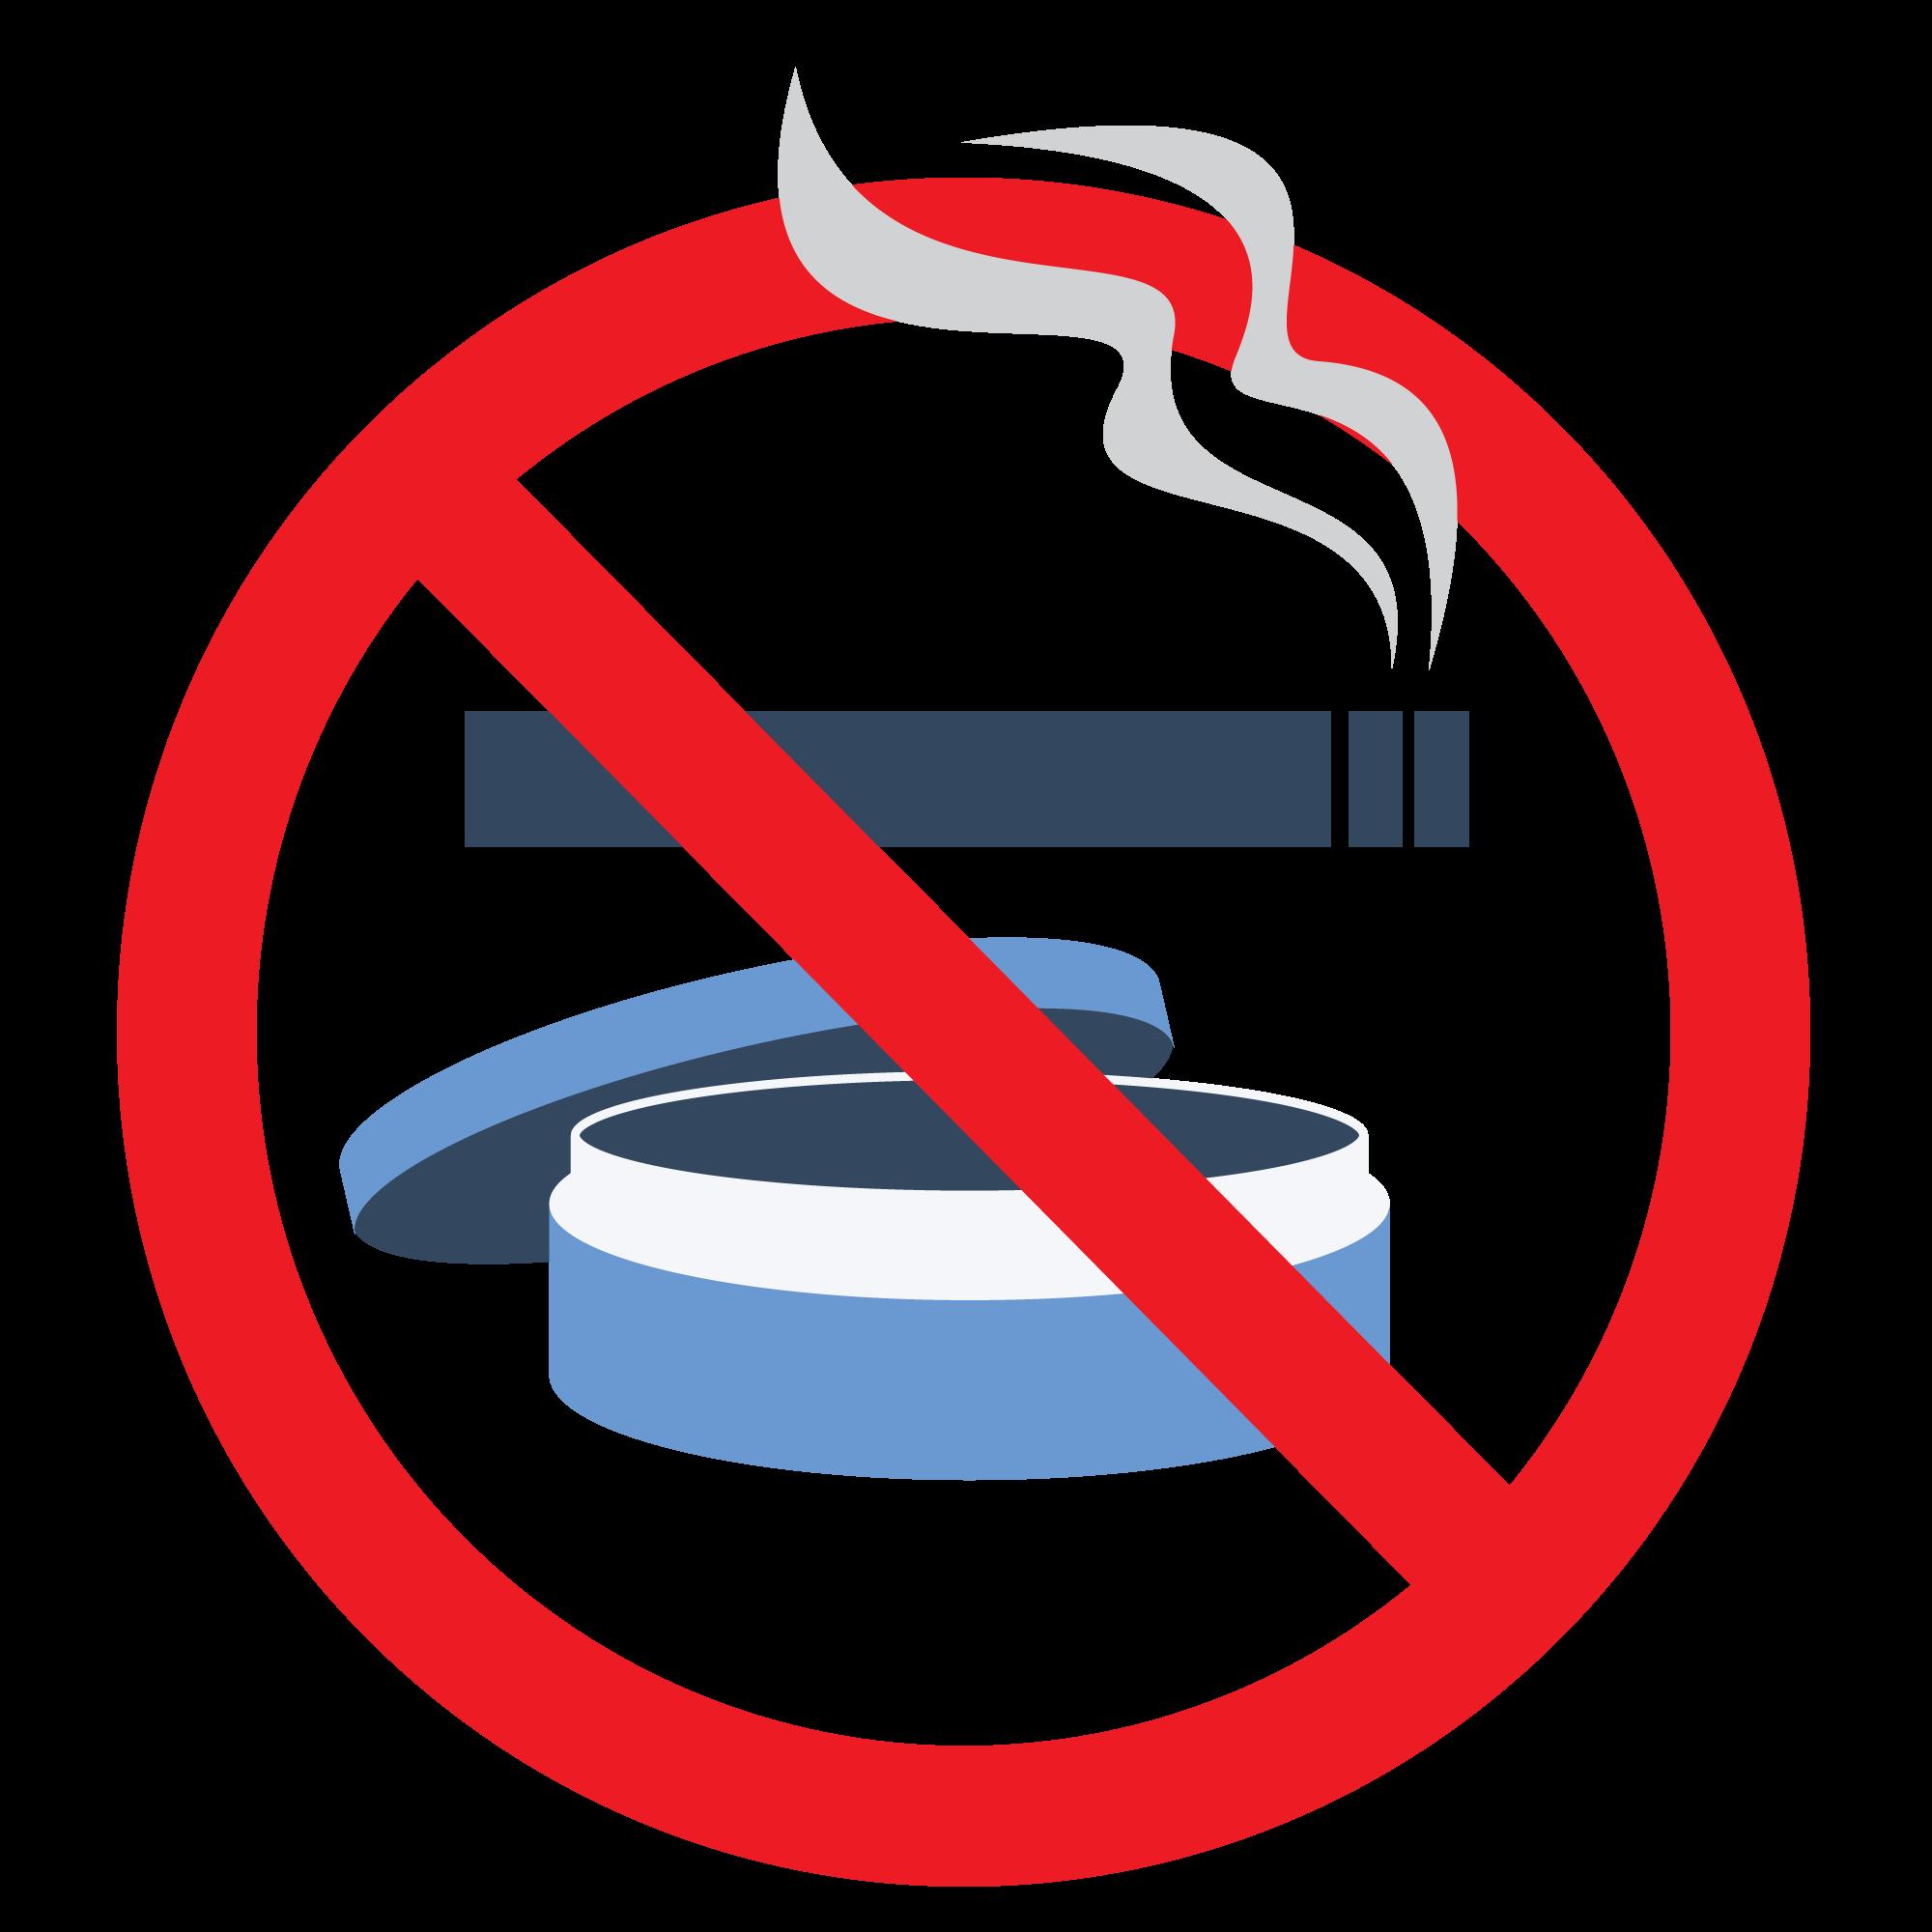 Download Image - No Tobacco PNG